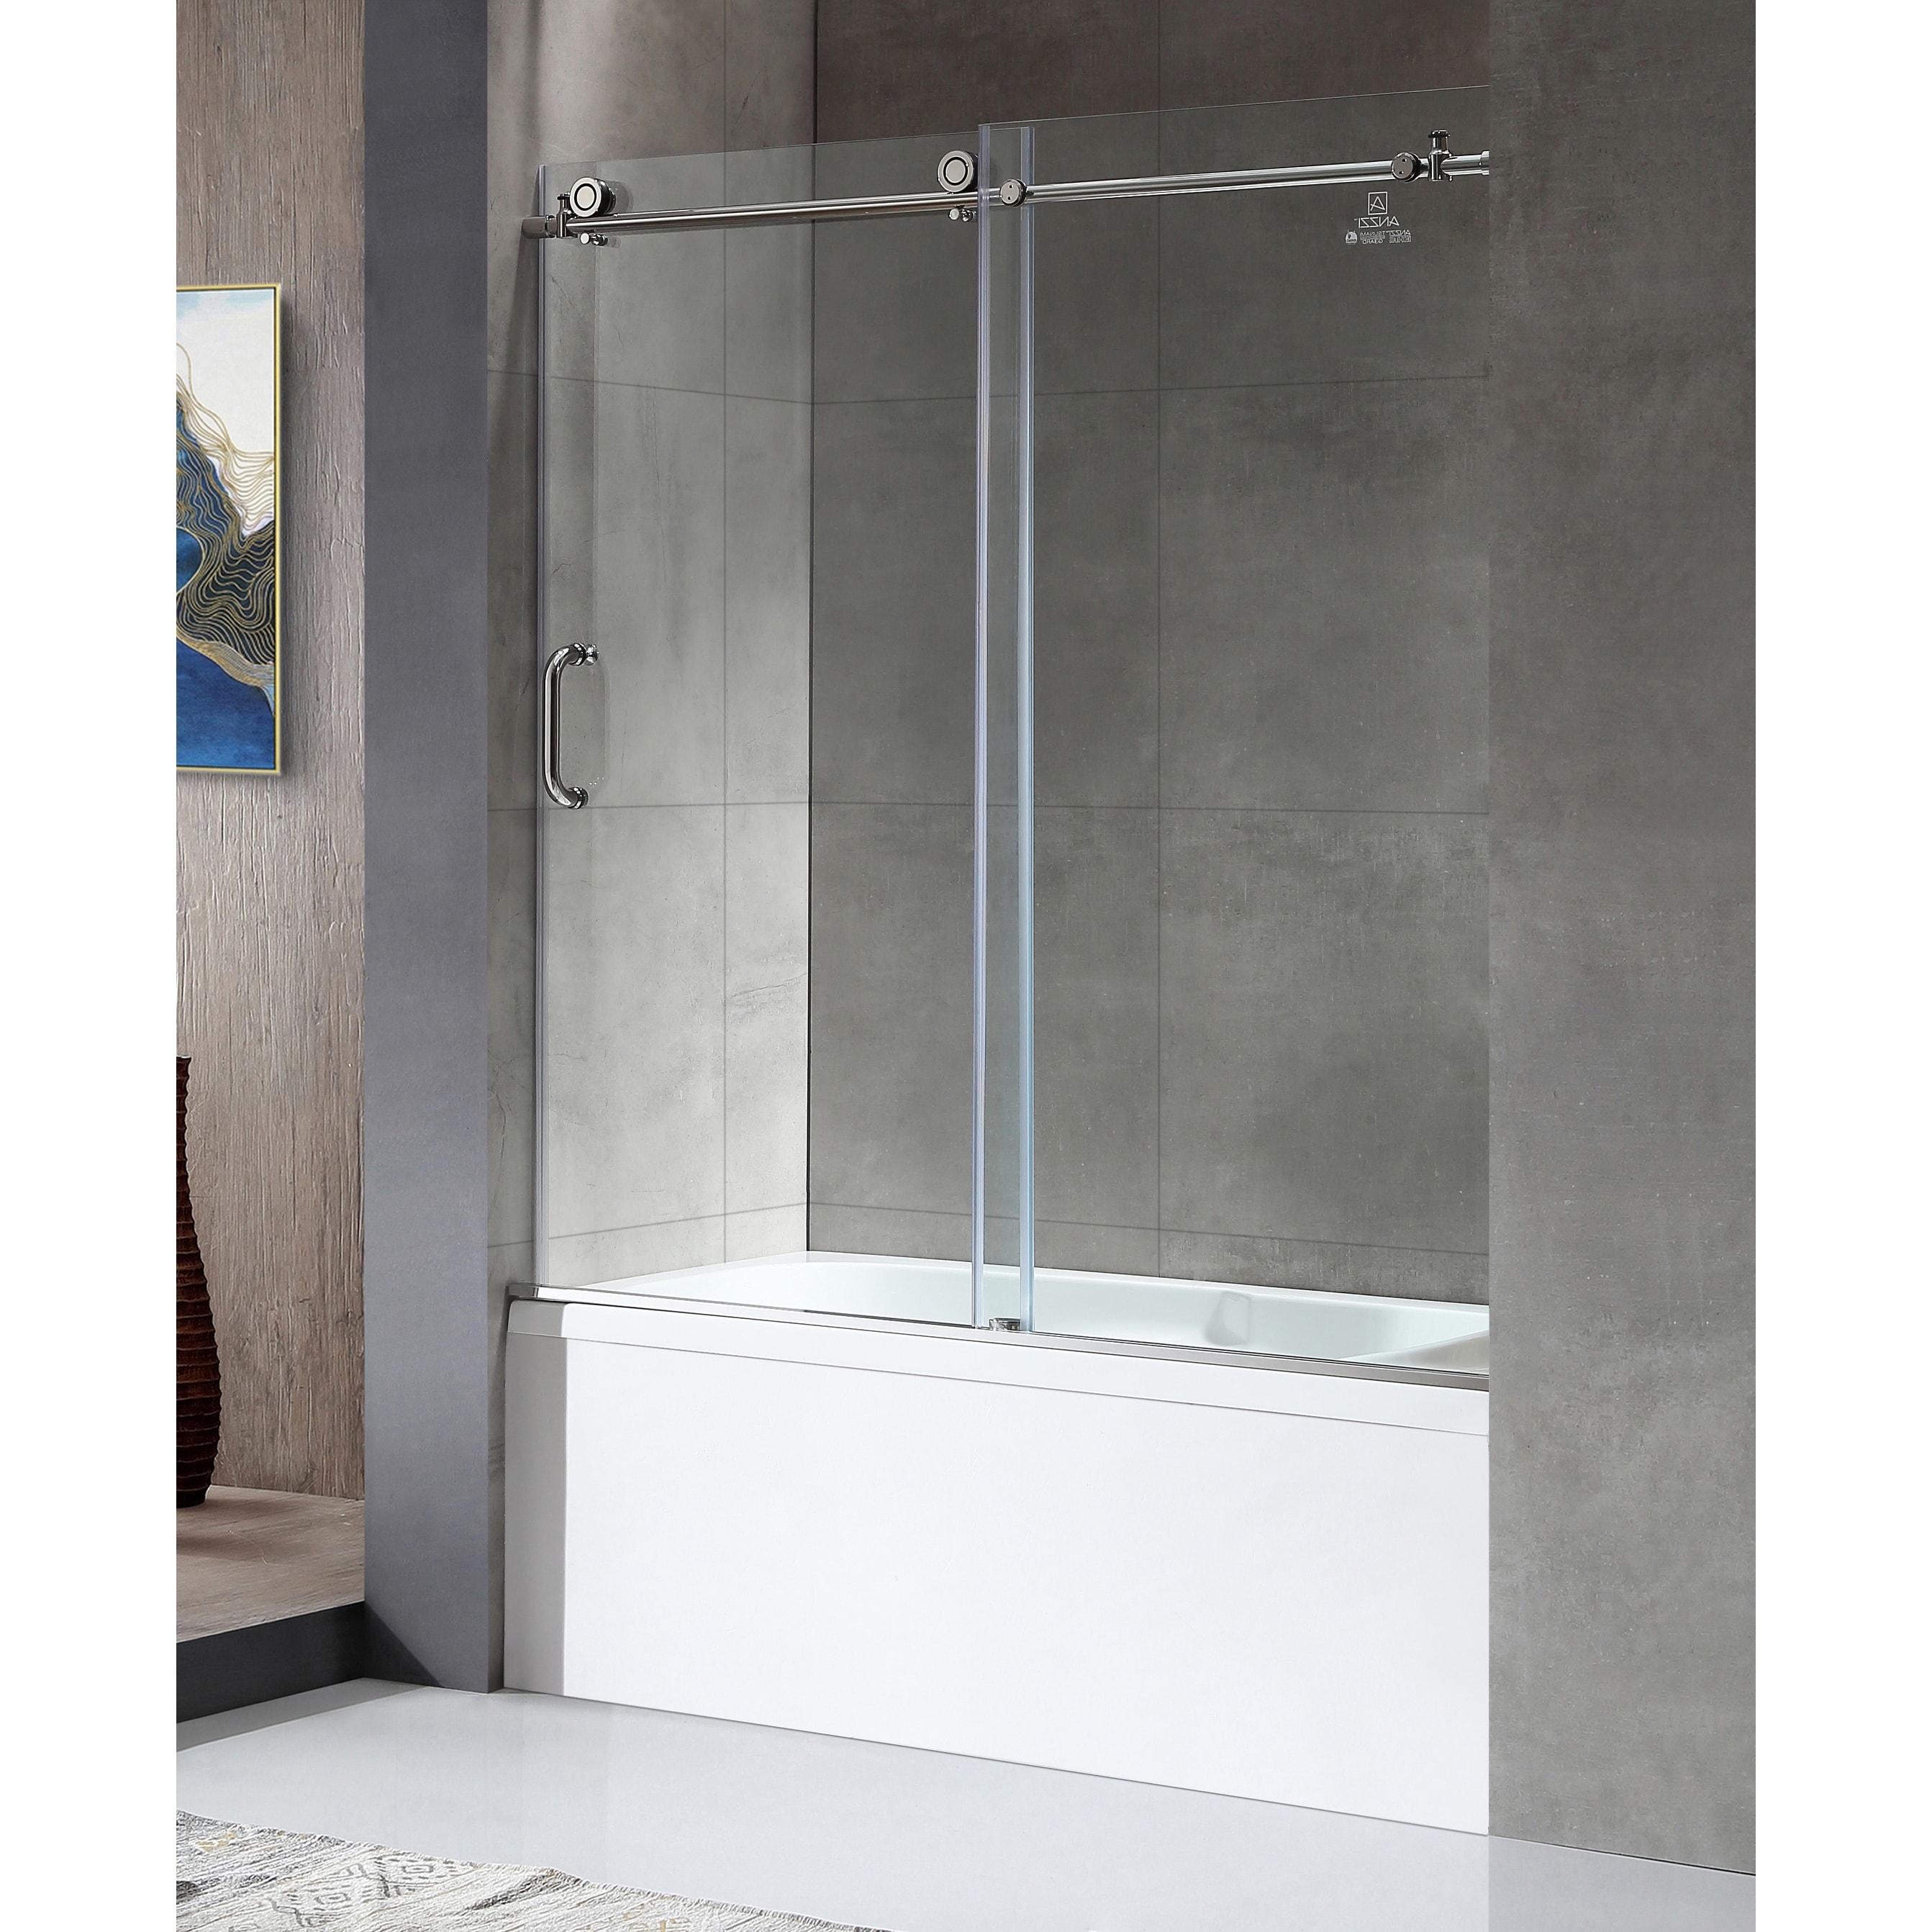 Anzzi Don 59 X 62 Frameless Sliding Tub Door In Polished Chrome